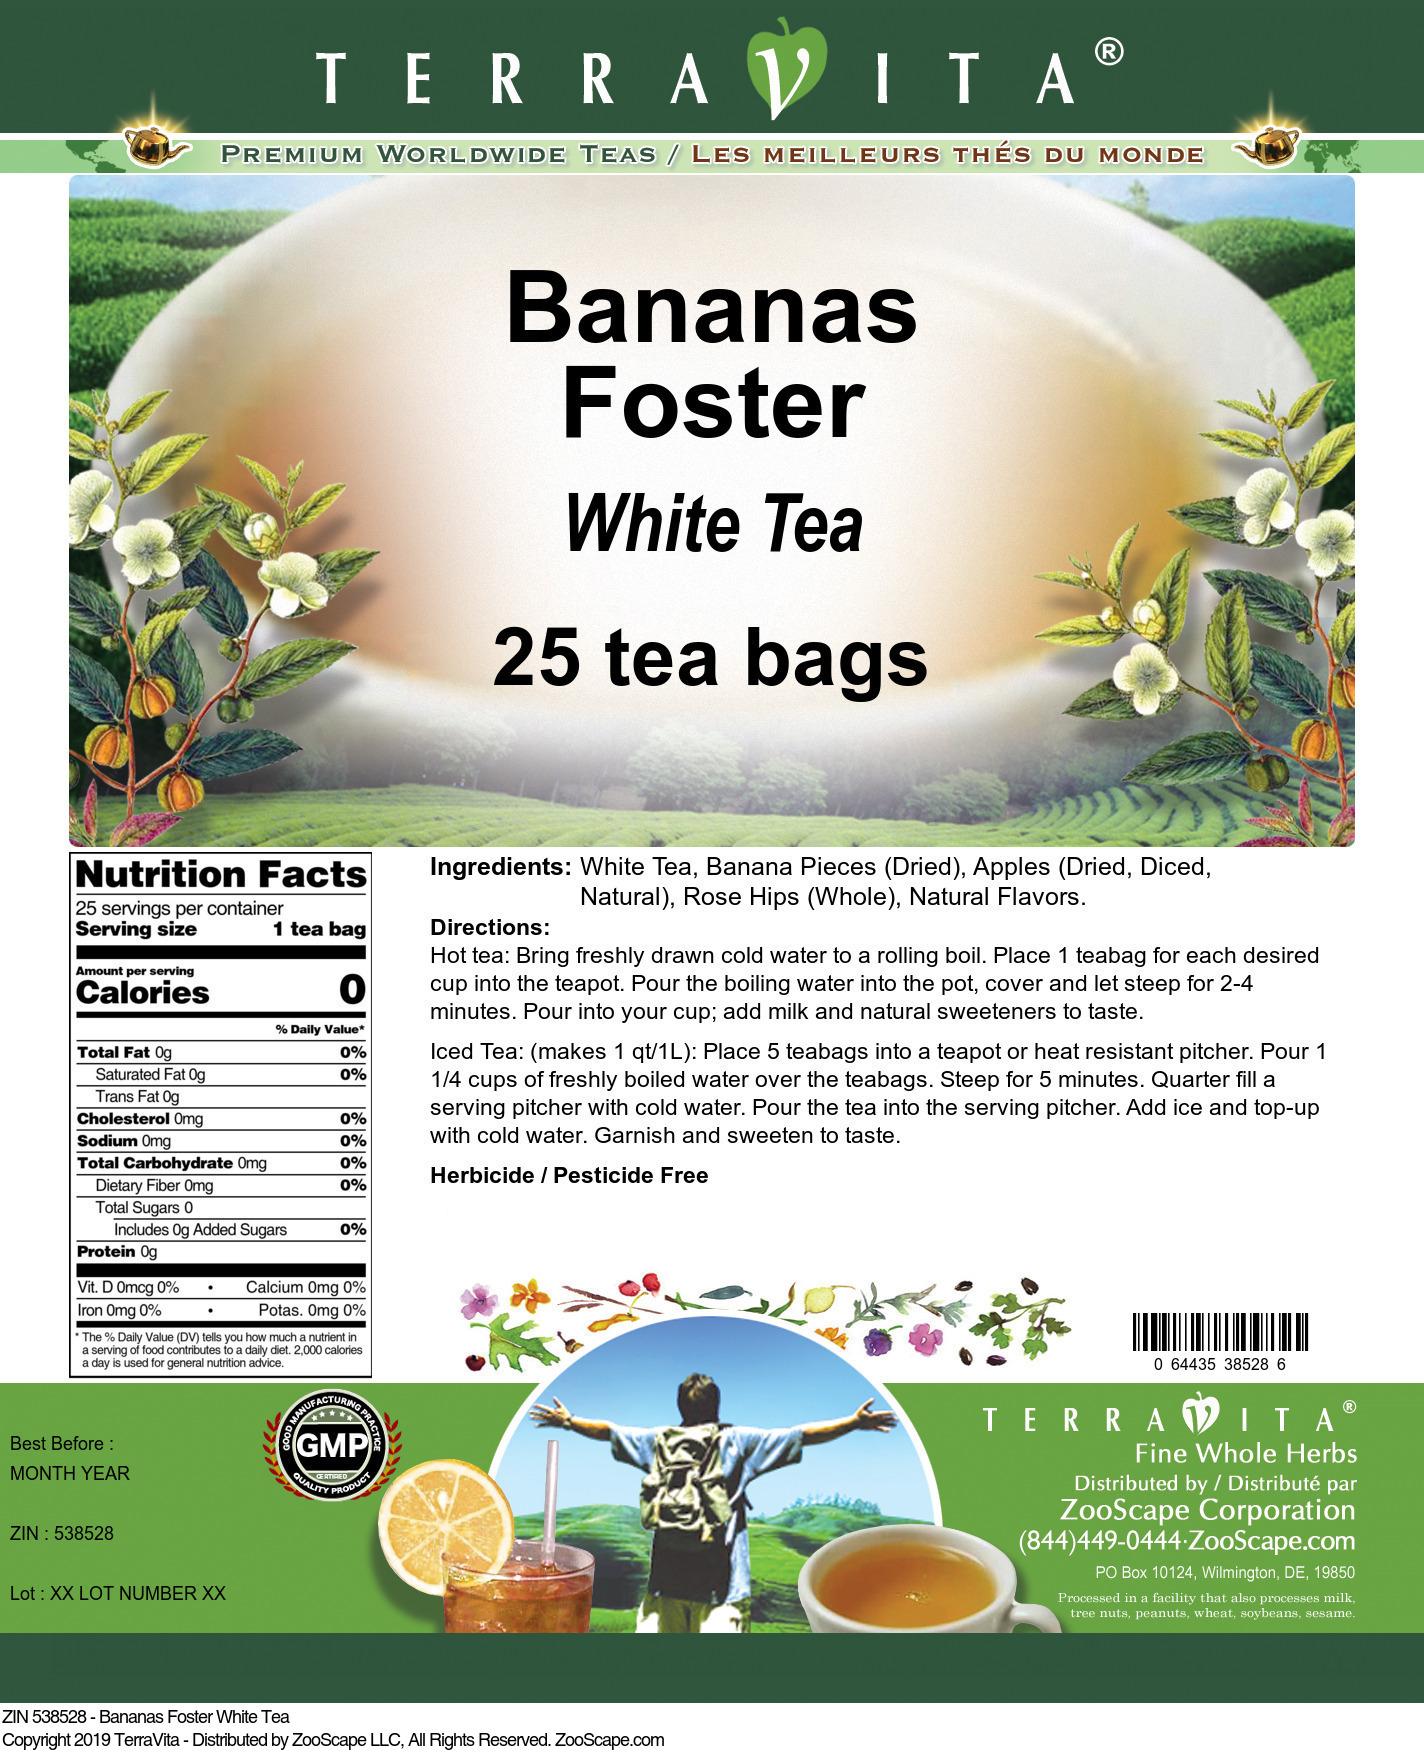 Banana Foster White Tea